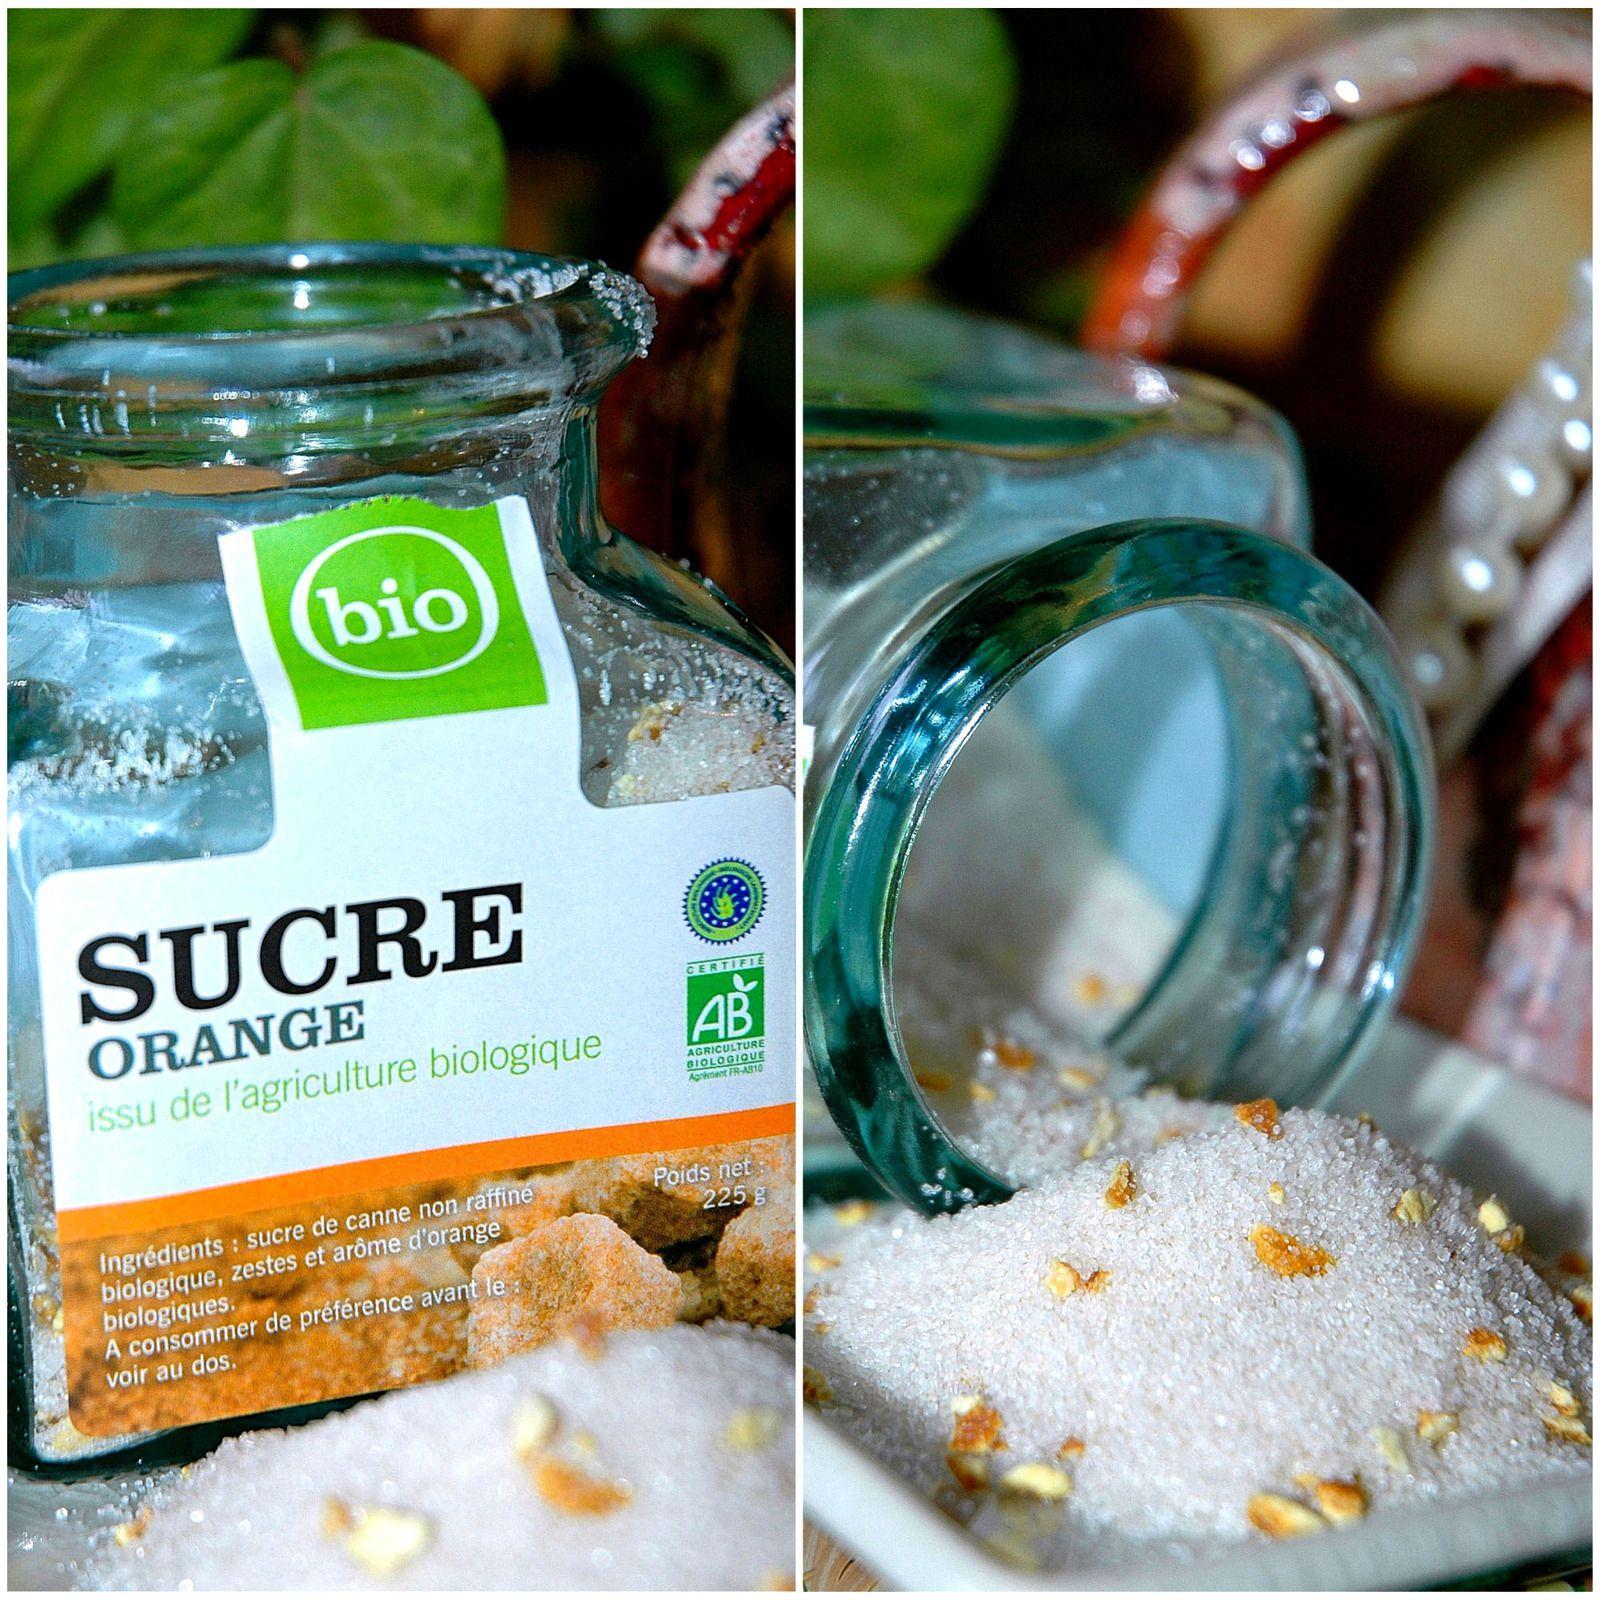 Brioche au sucre à l'orange Bio et oranges confites